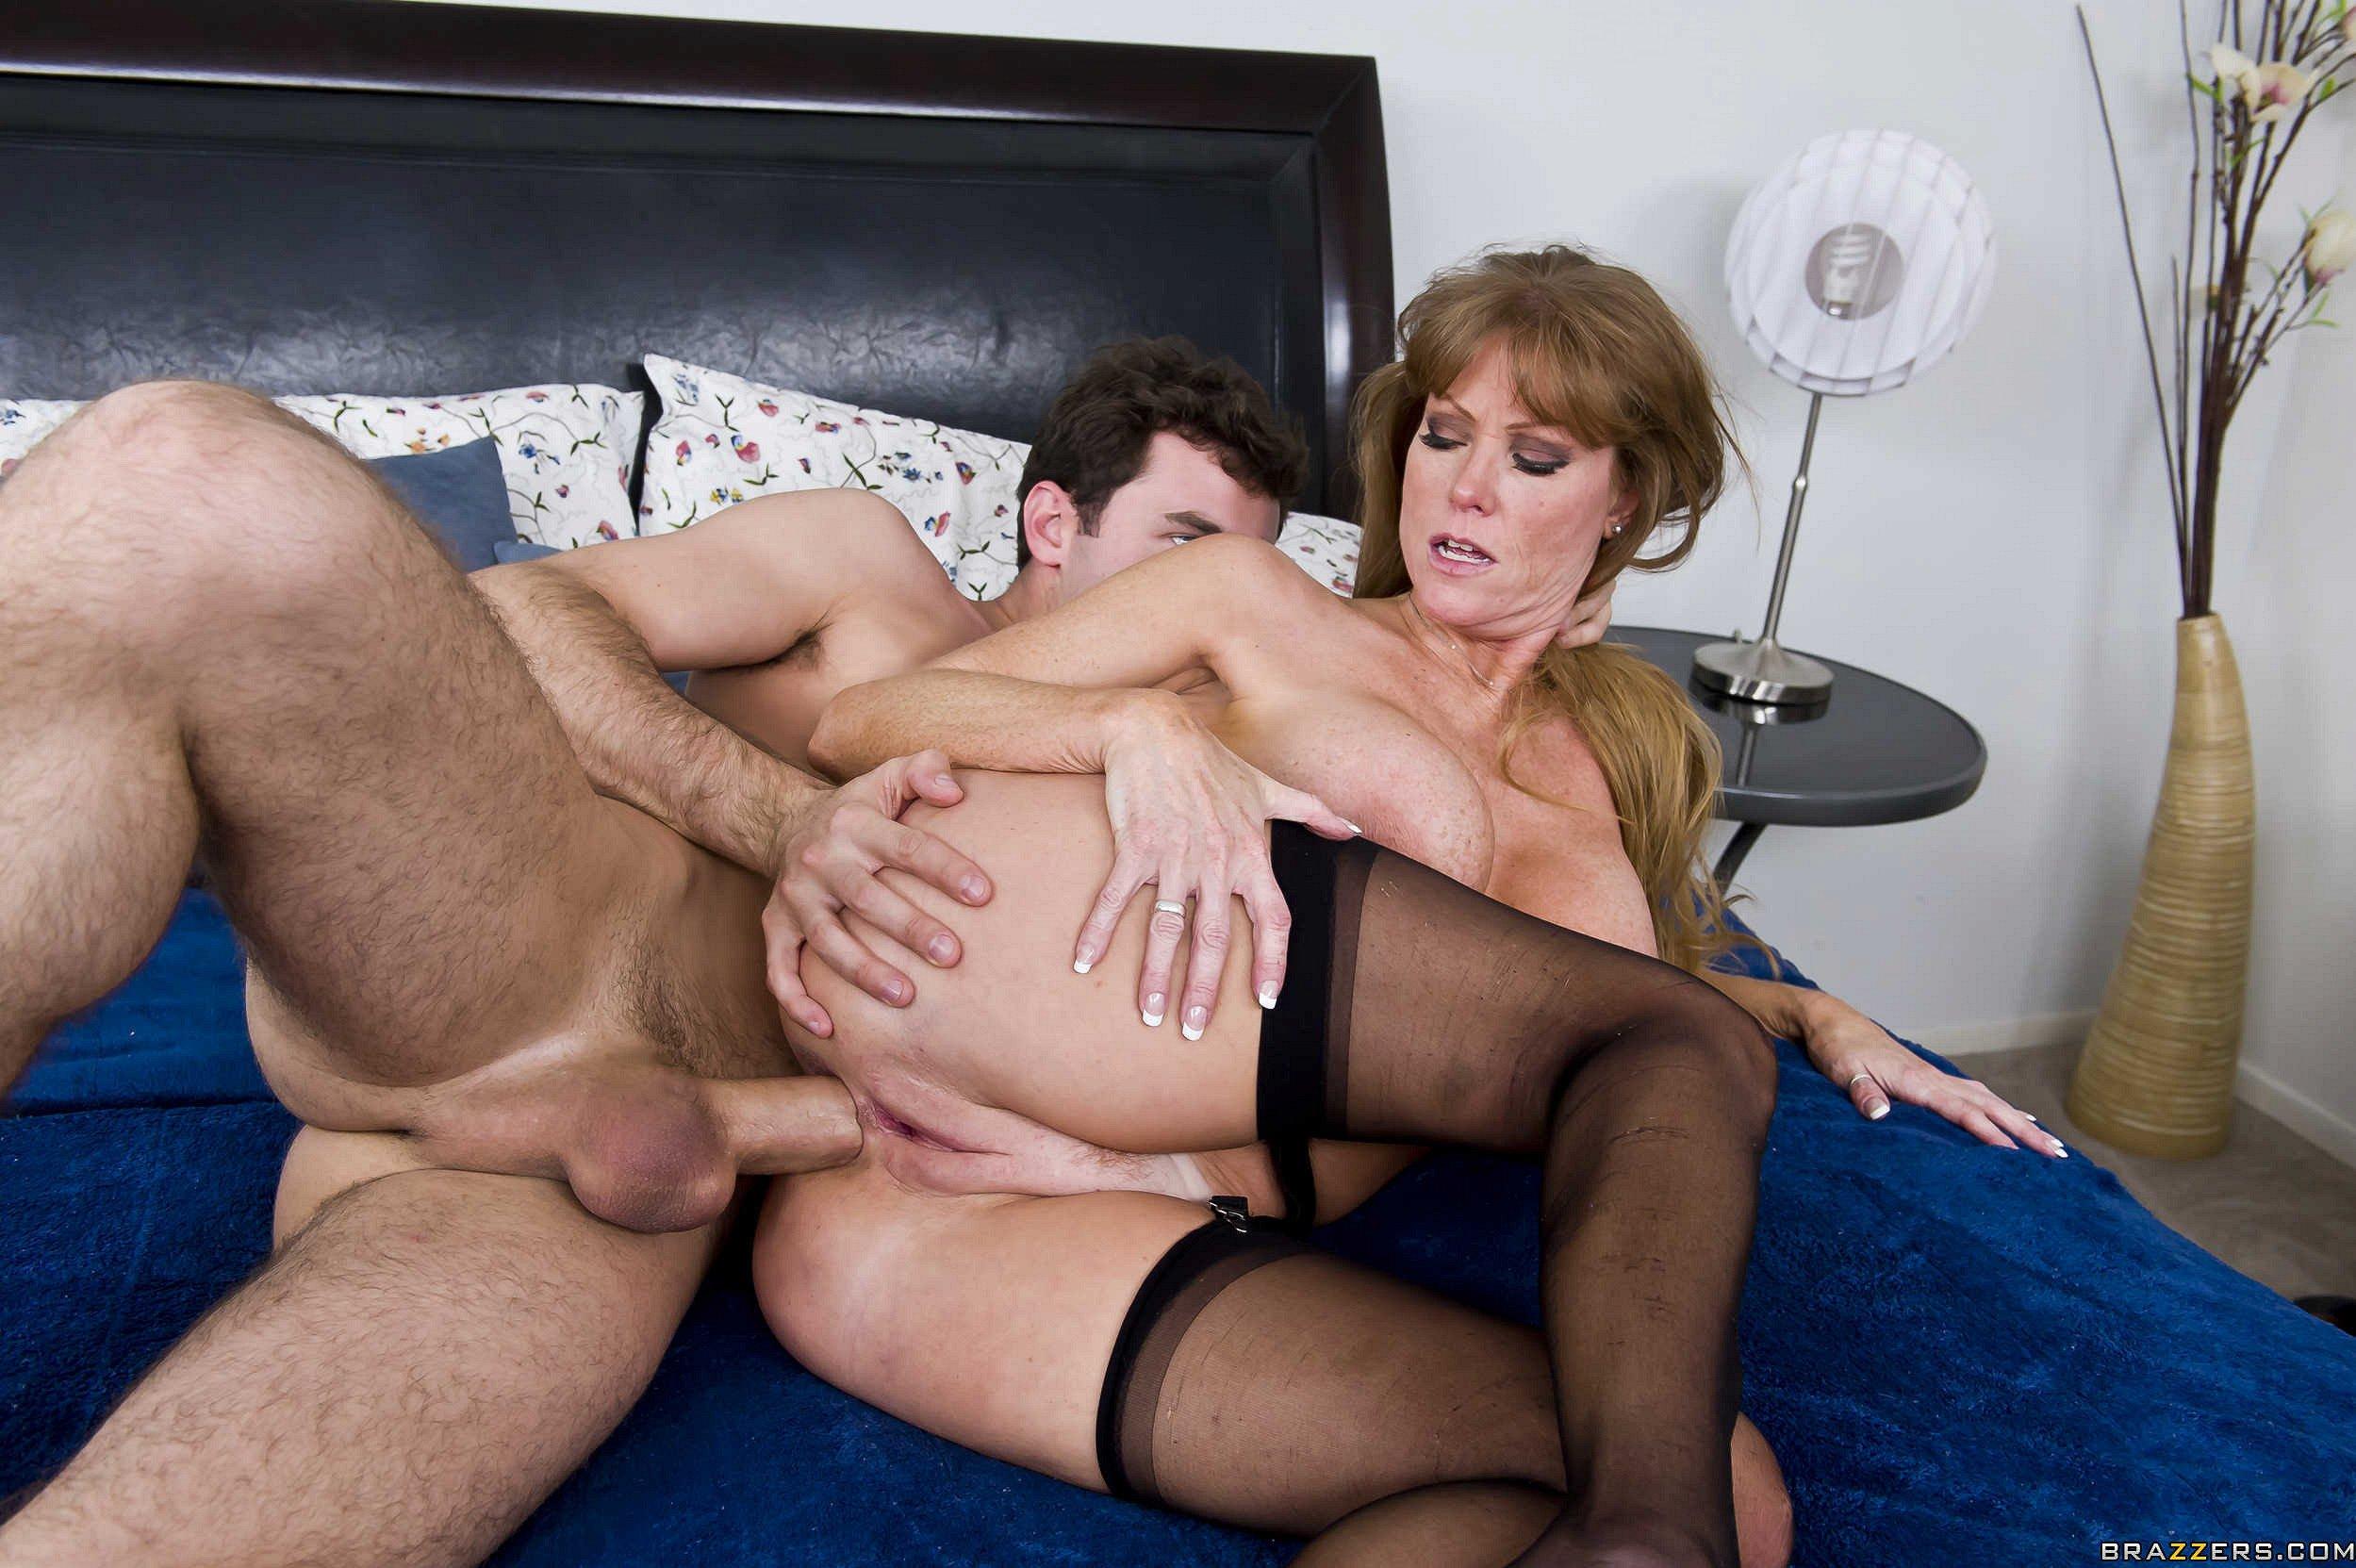 Секс Со Взрослым Онлайн